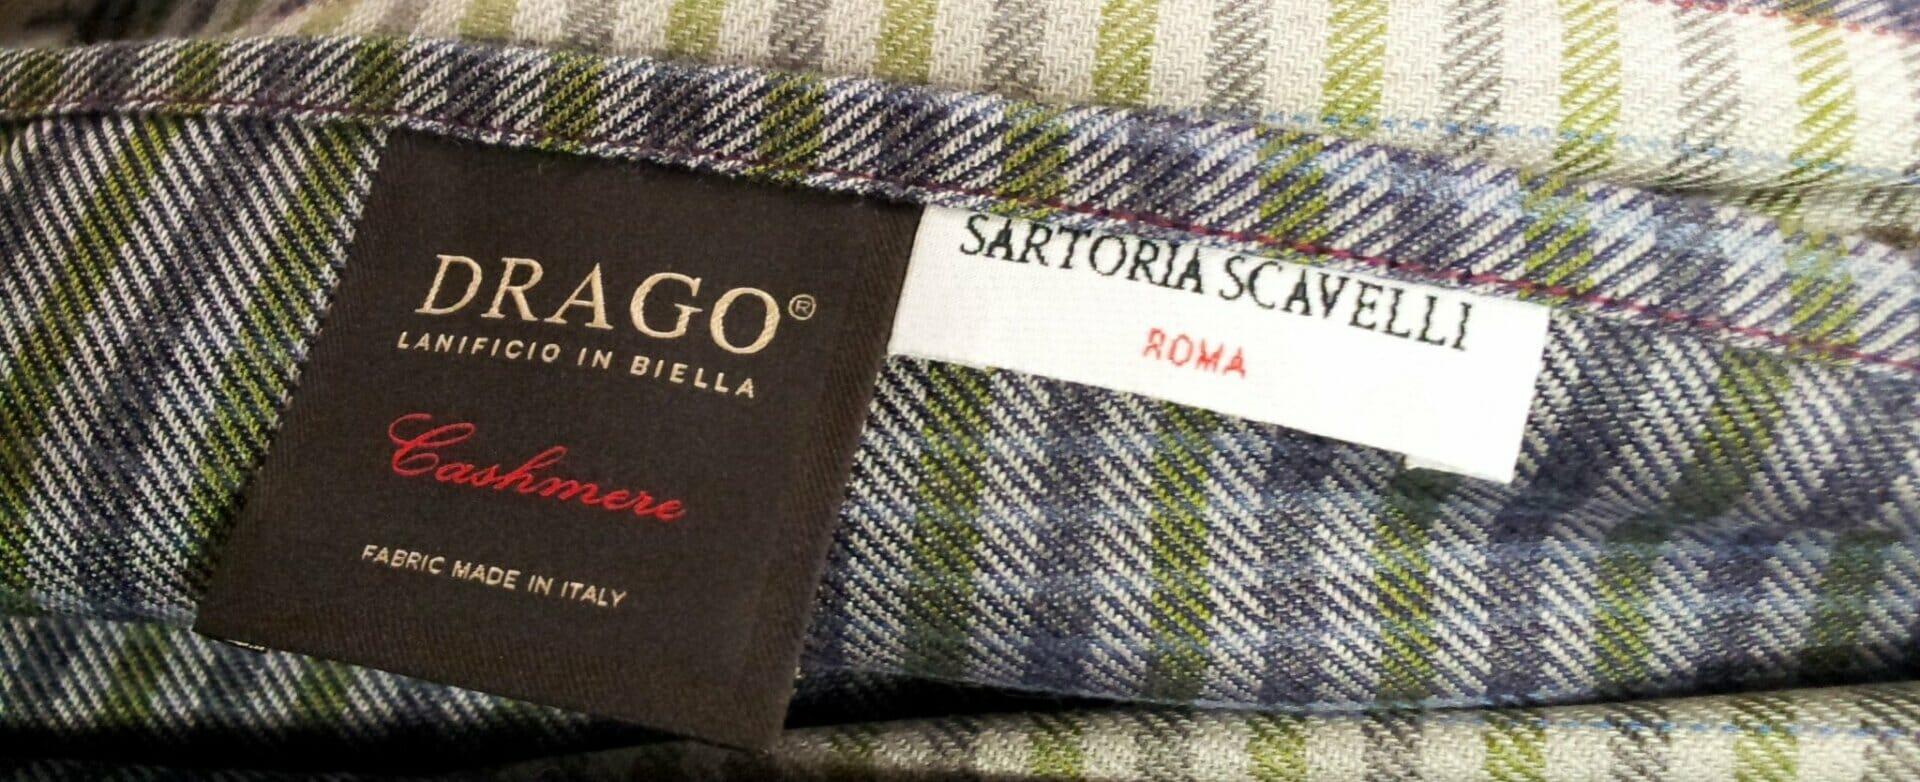 Sciarpe cashmere A/I 2013 ~ Sartoria Scavelli Roma